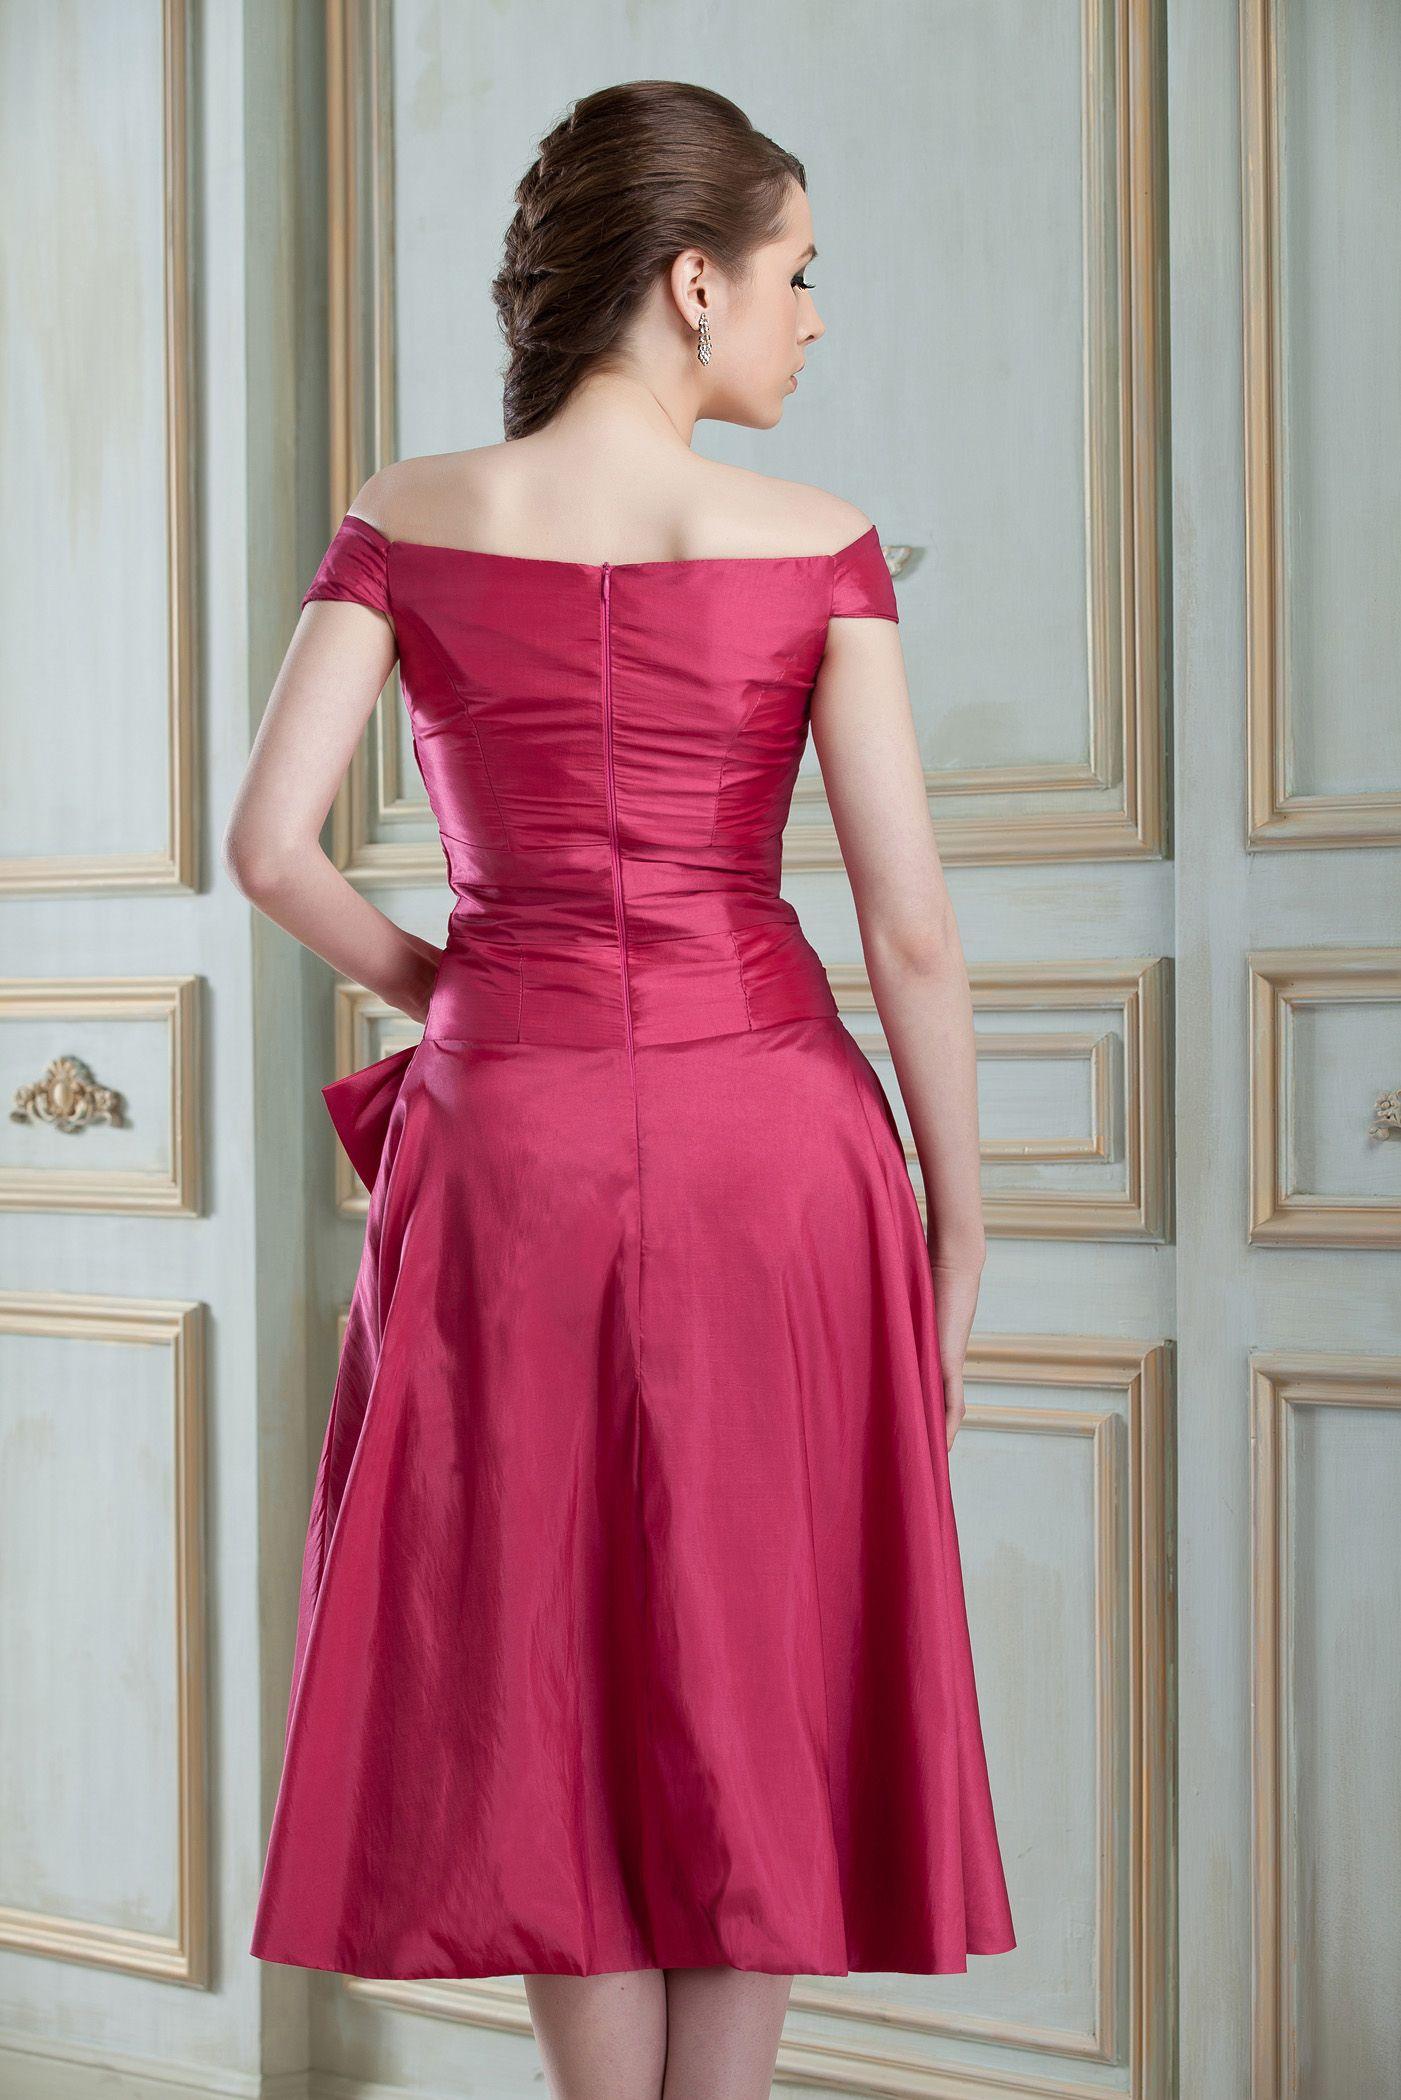 Bonito Prom Talla De Ropa 2 Modelo - Colección de Vestidos de Boda ...